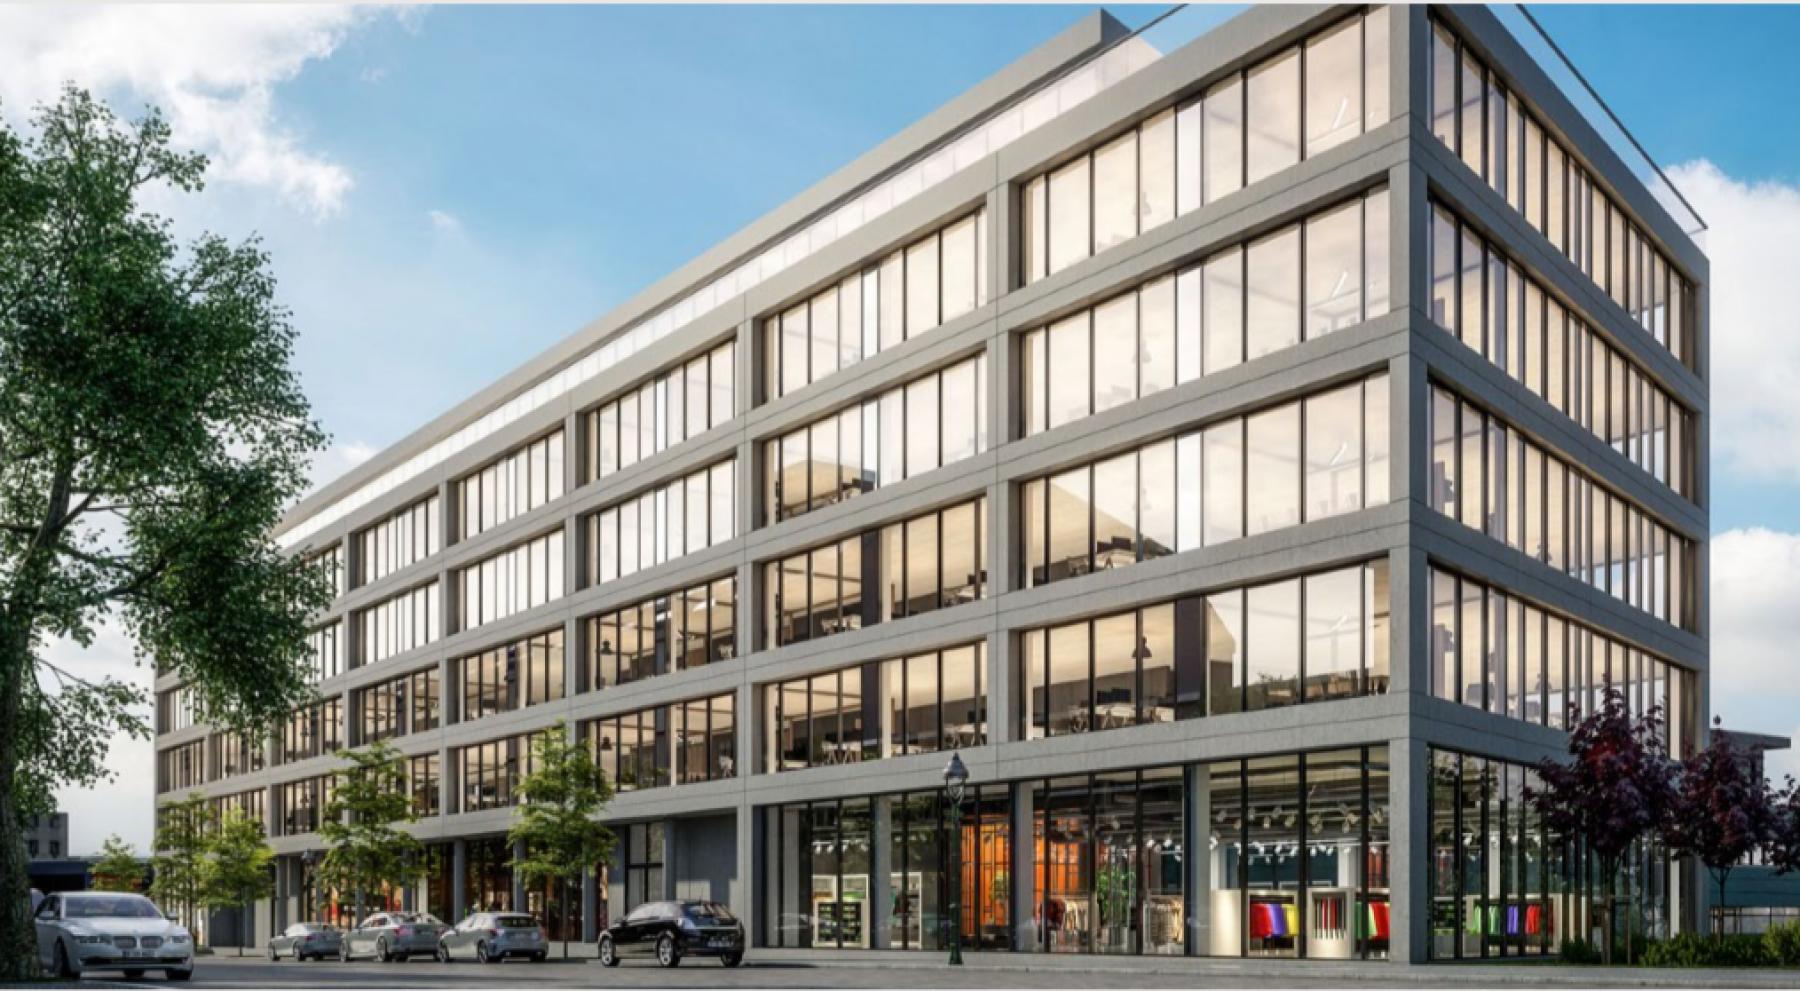 Hochmoderne Fassade des Business Centers in Berlin Mitte